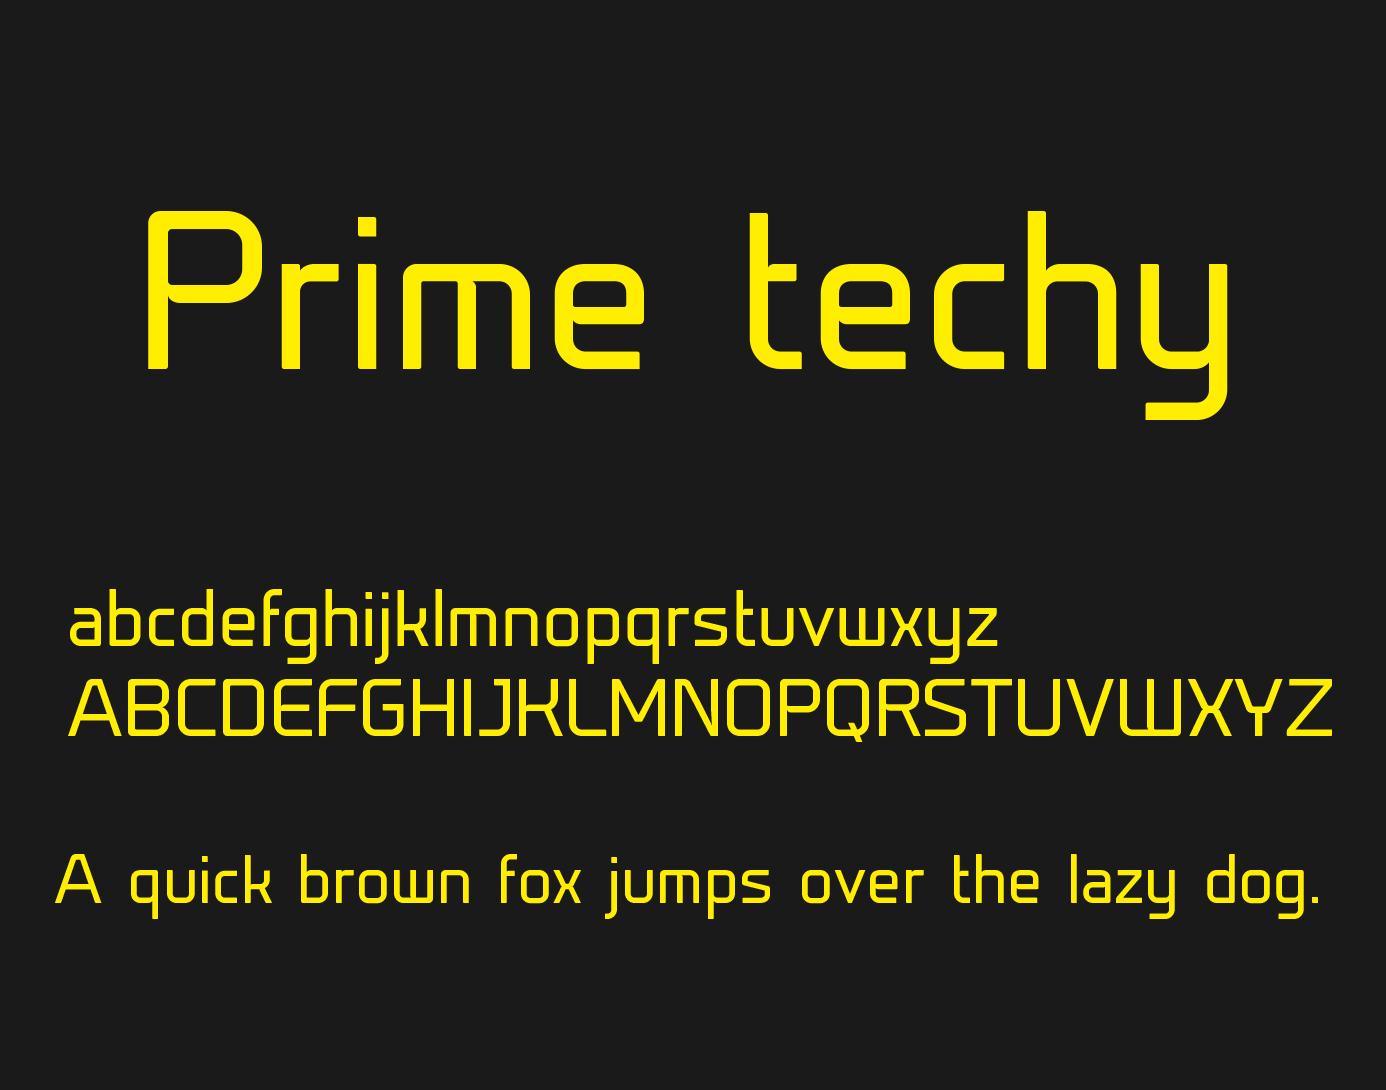 https://fontclarity.com/wp-content/uploads/2019/09/prime-font-download-0.png Free Download